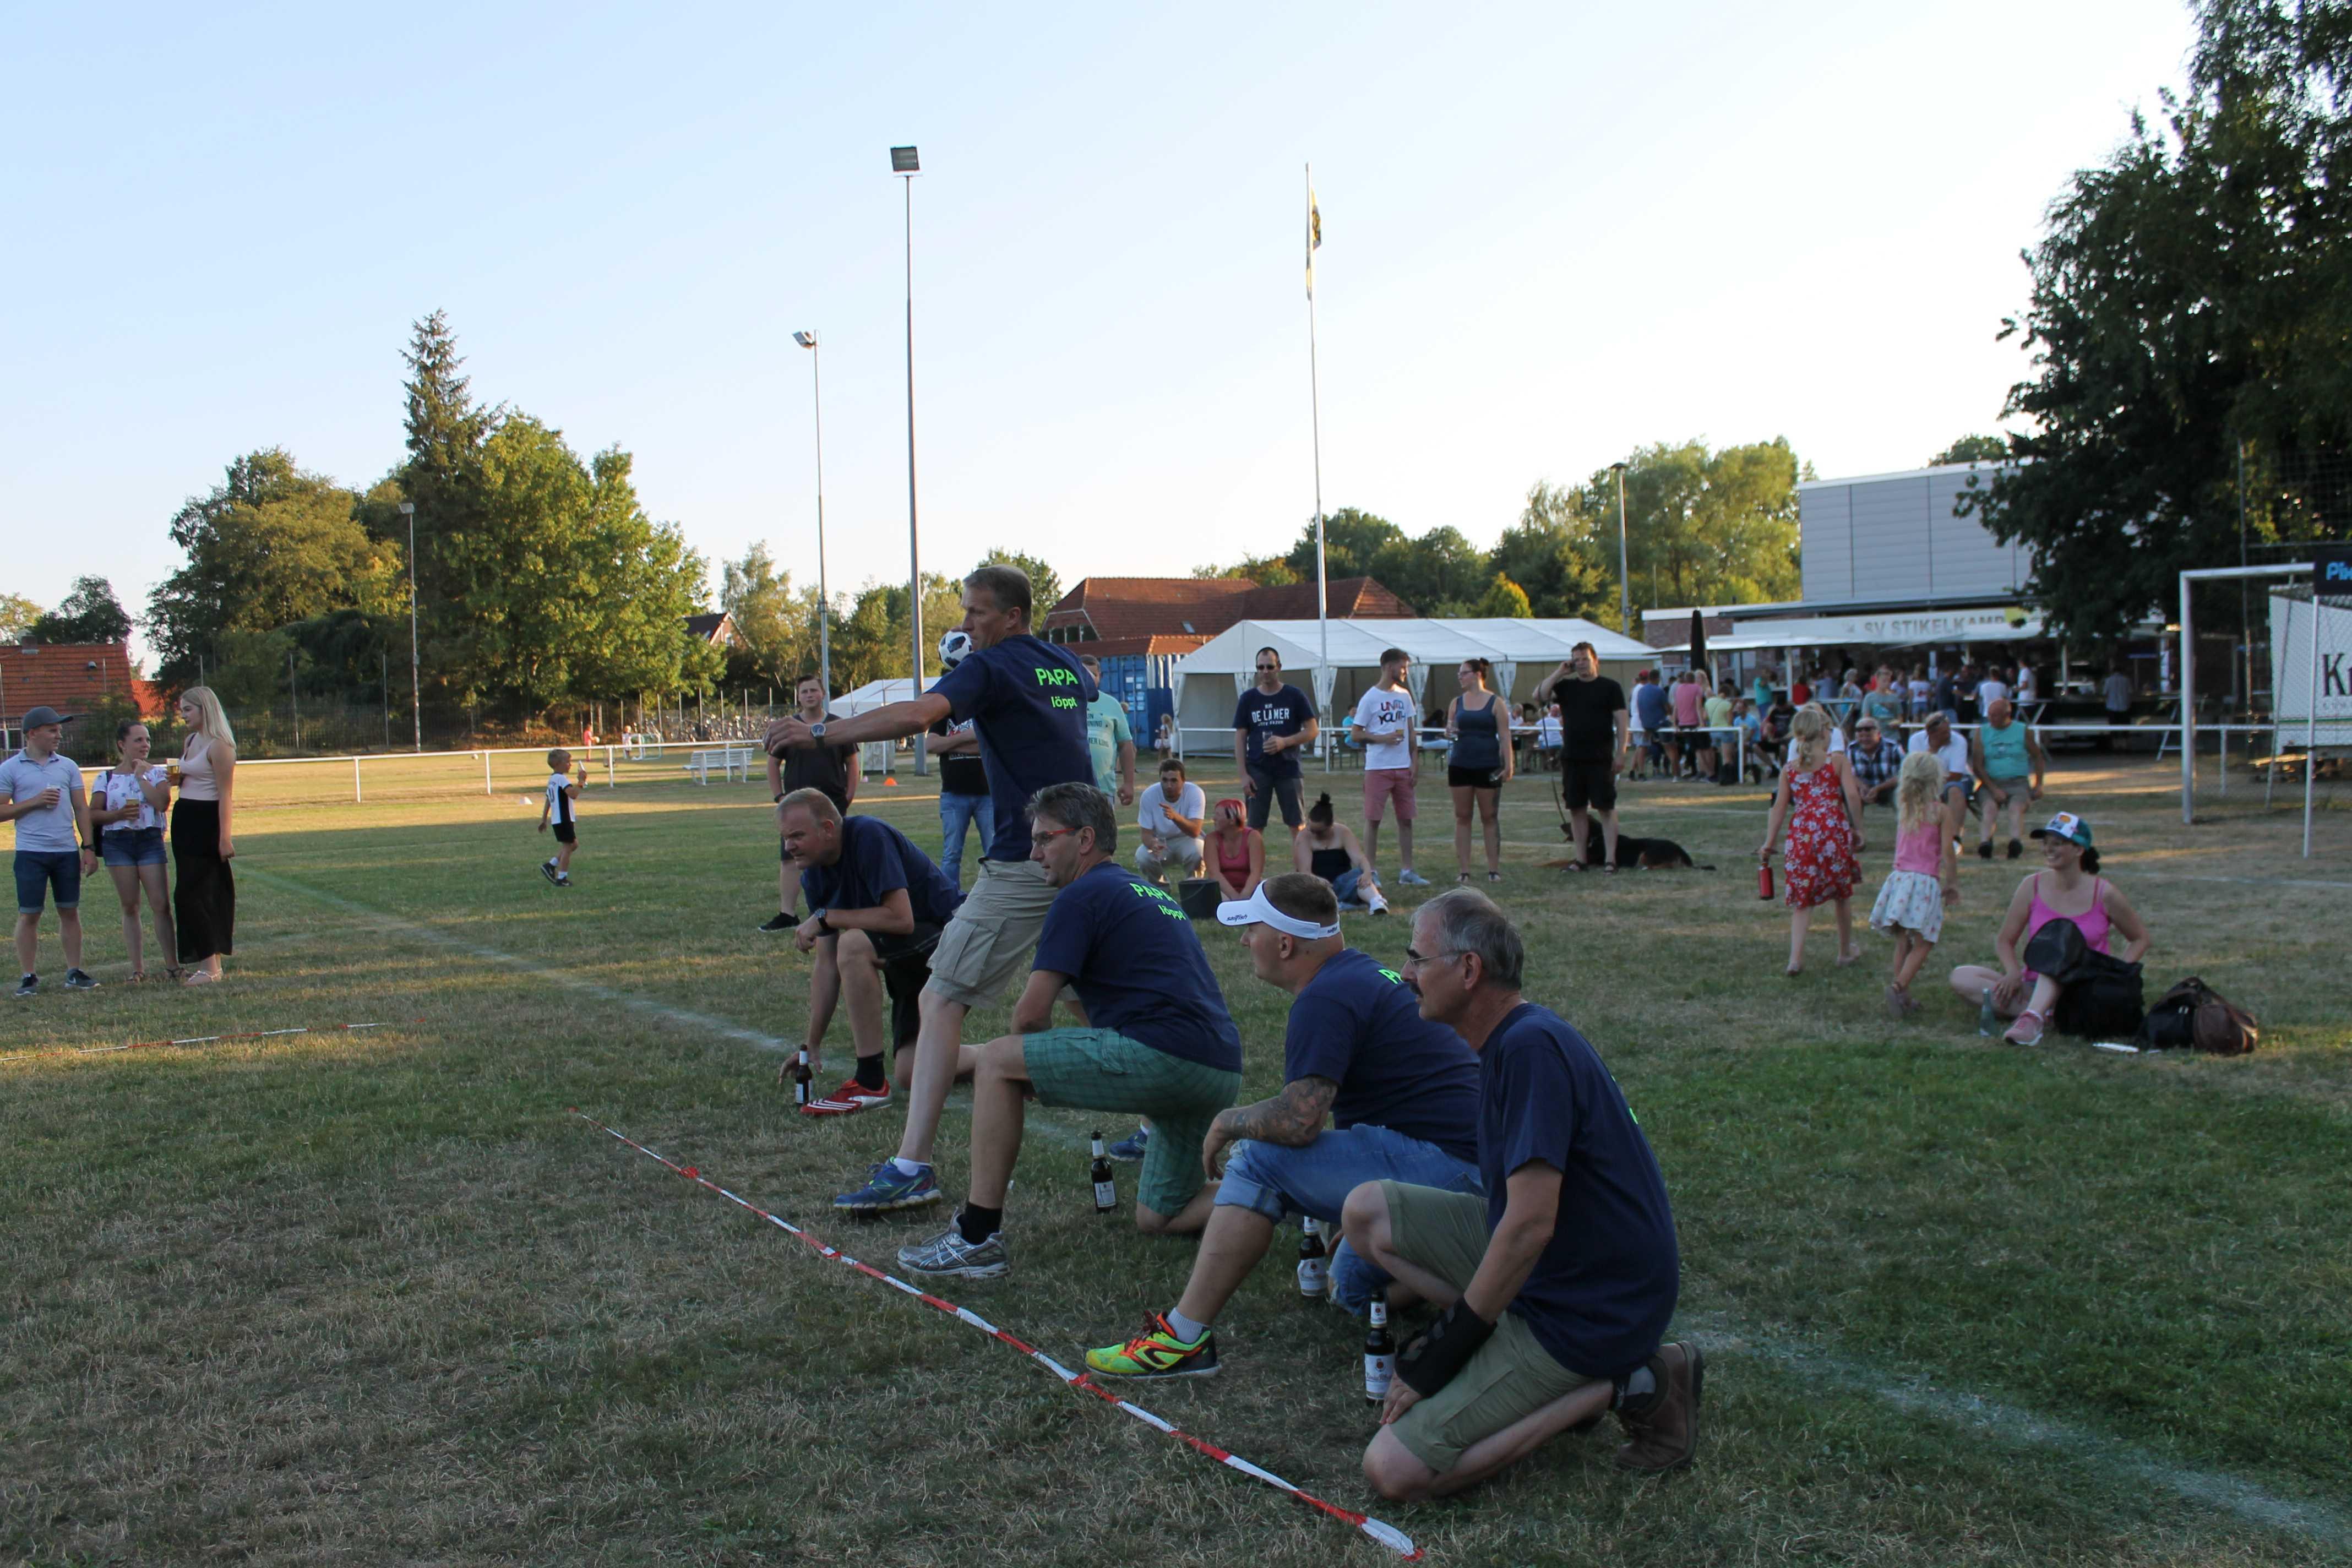 2018-07-27 Sportwoche - Flunkyball Turnier (49)